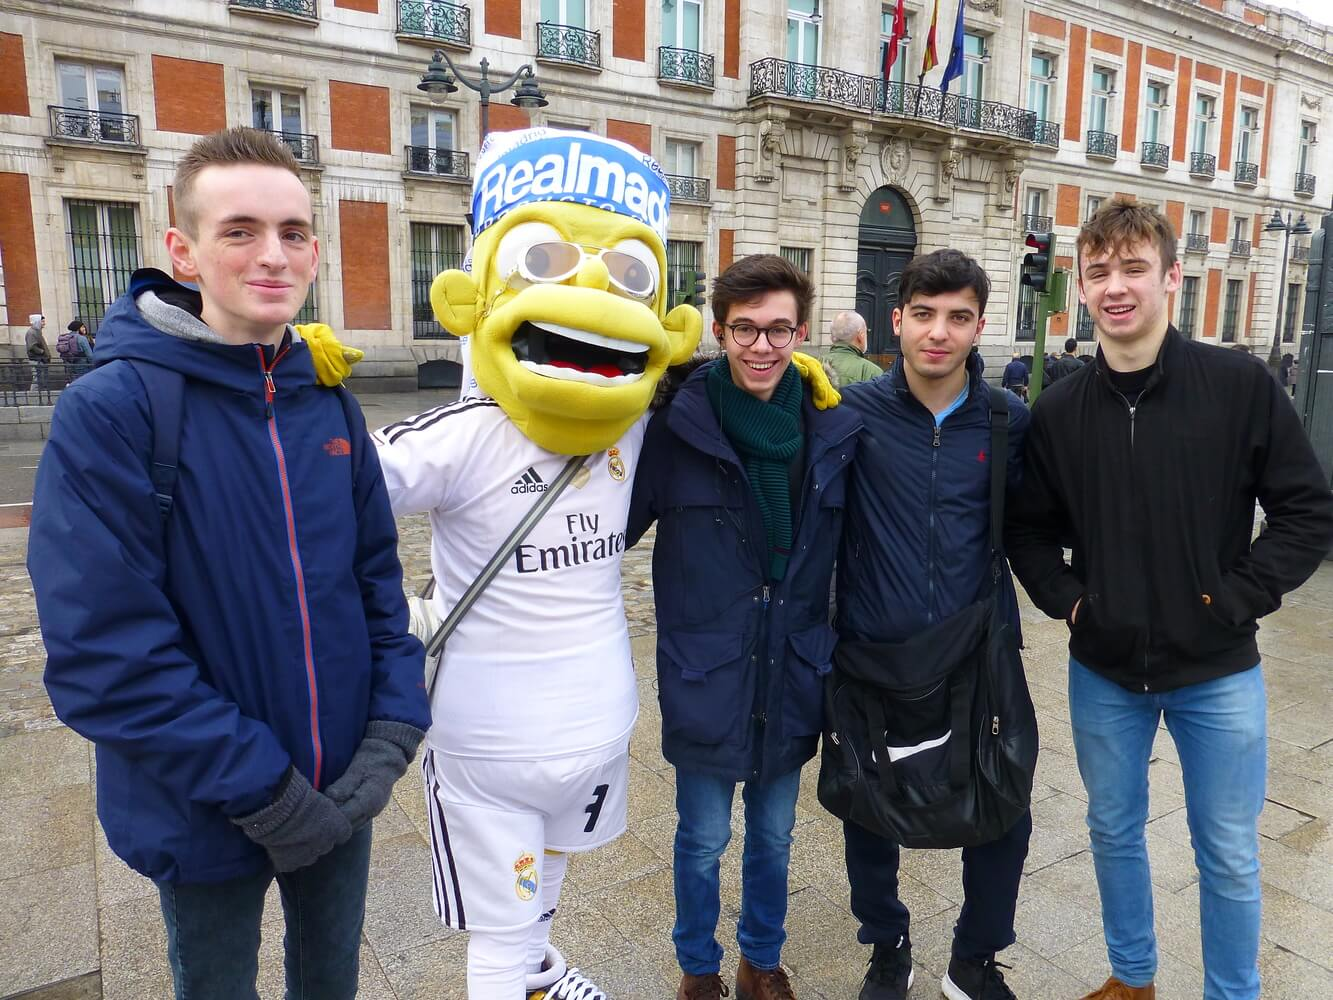 Visit of students of Manchester Grammar School, Puerta de sol